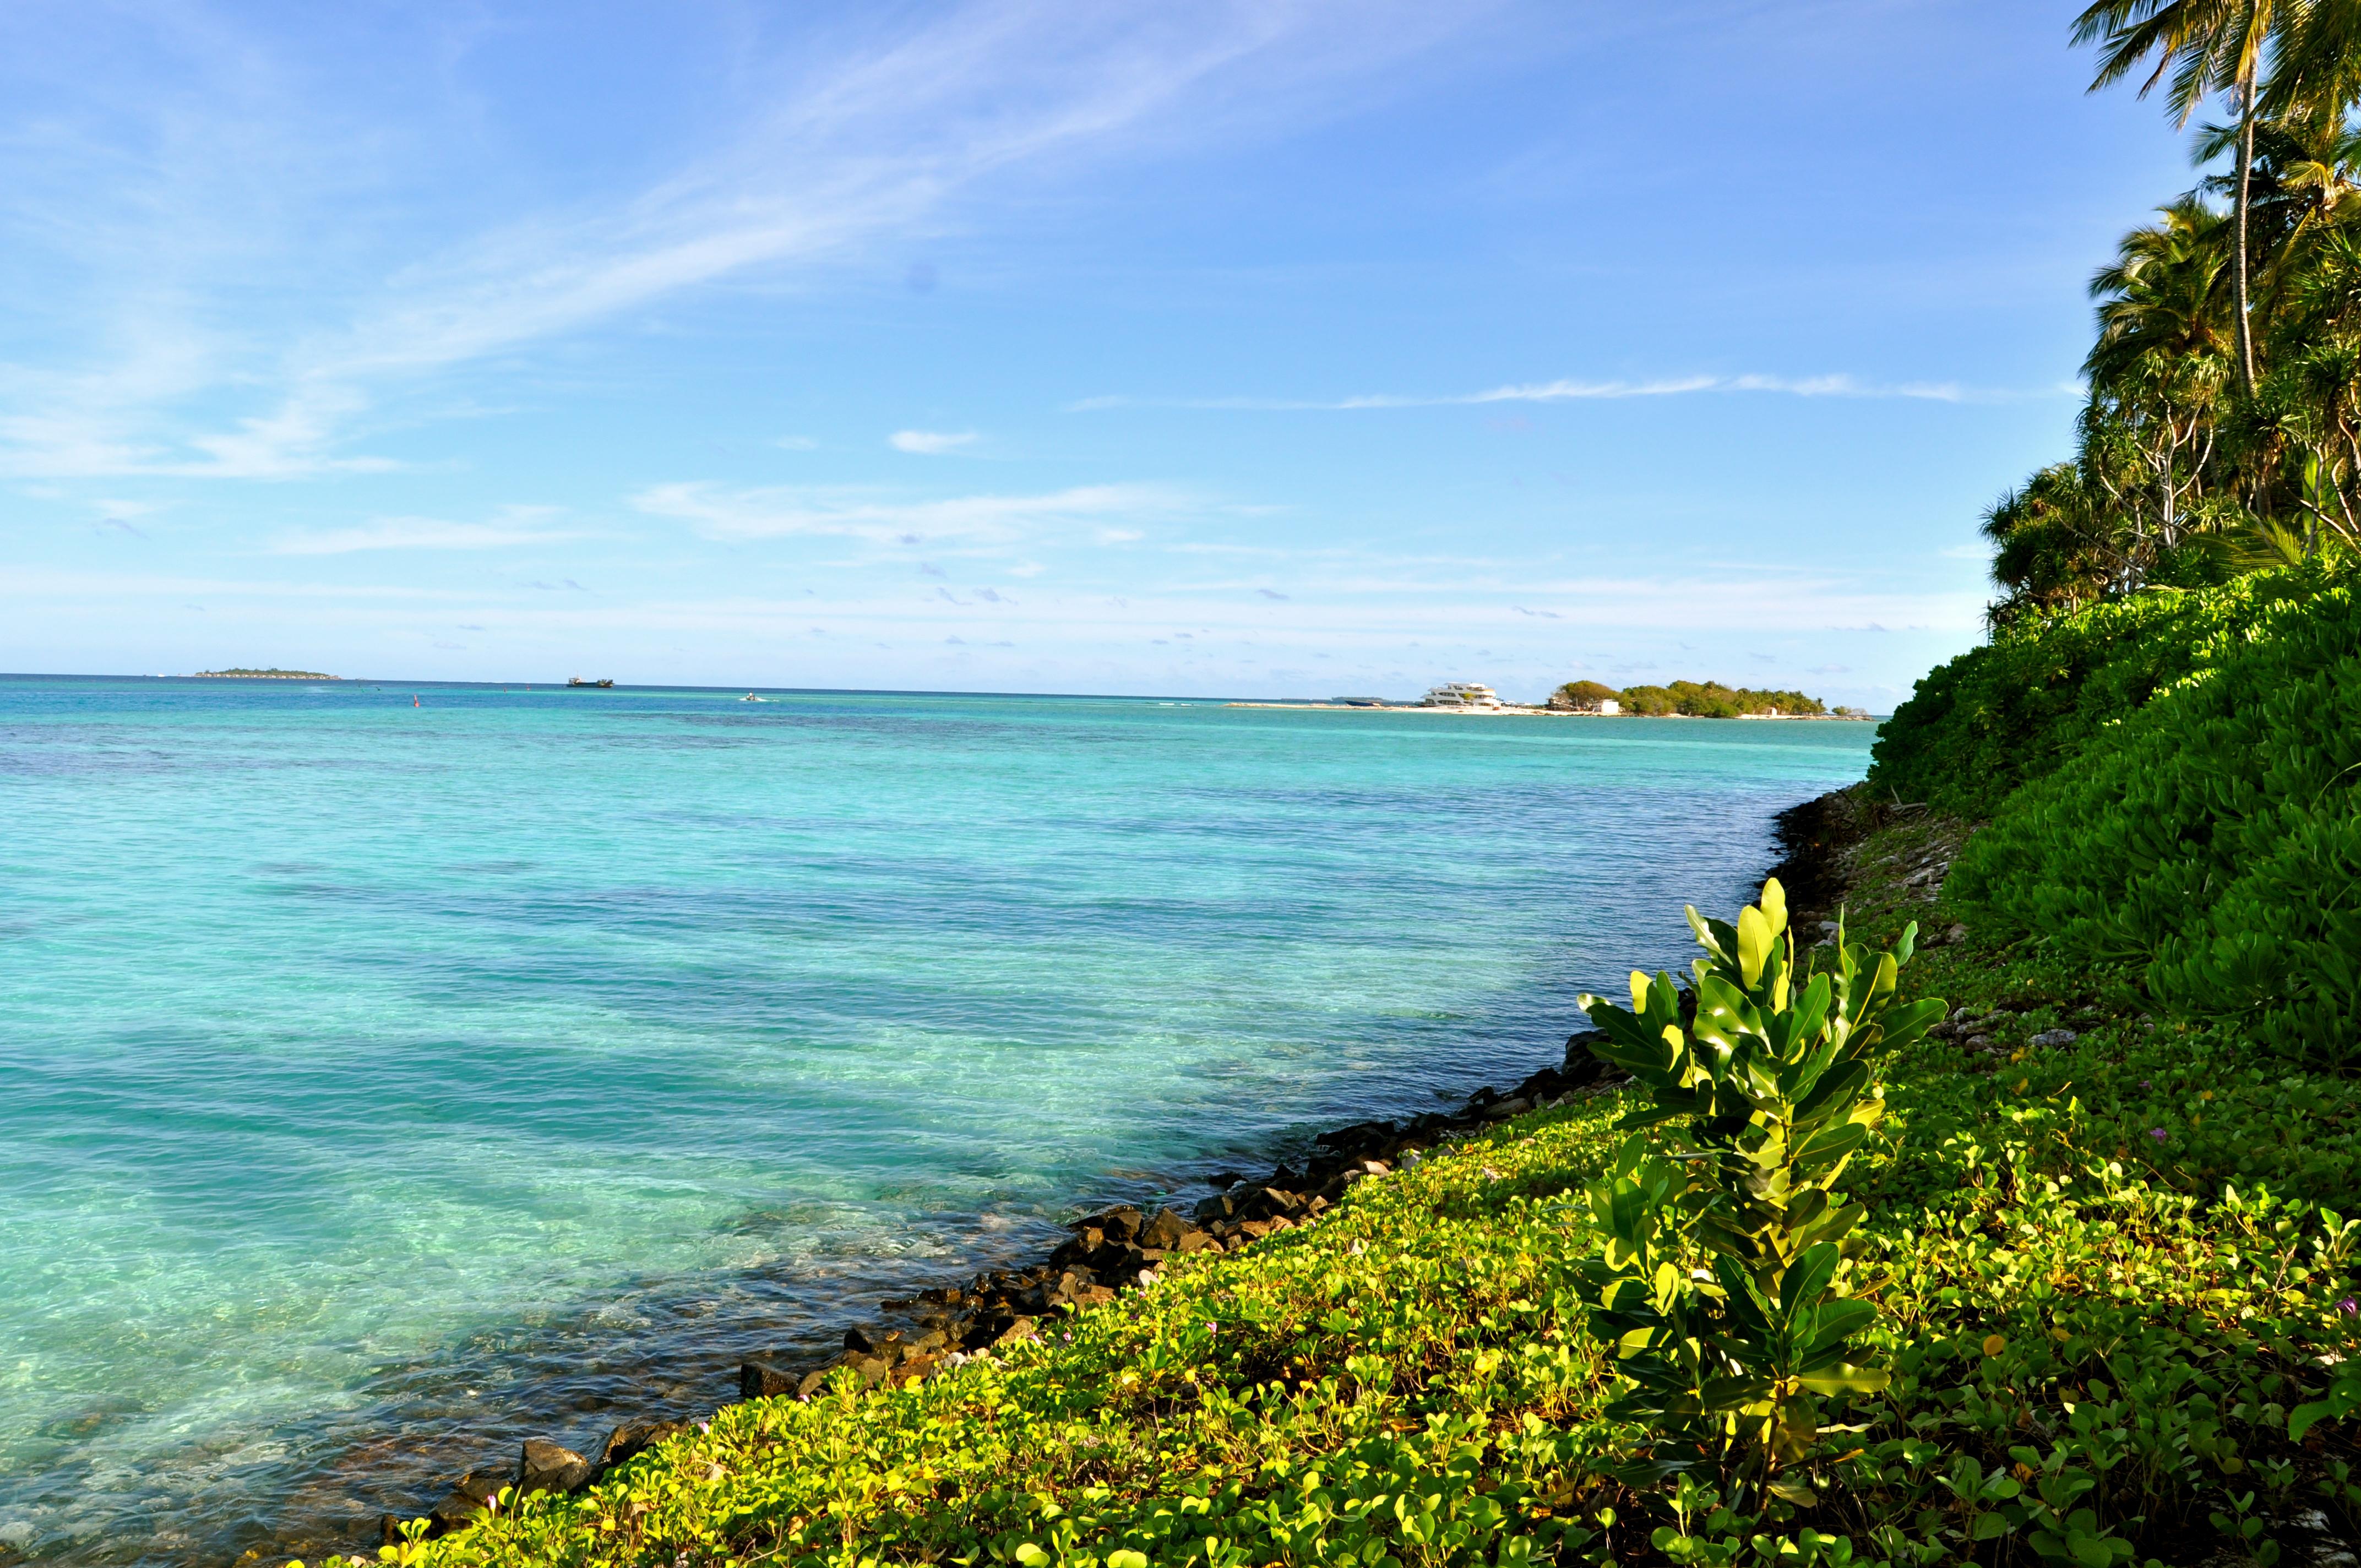 maldives-sea-level-climate-creditsarah-ackerman.jpg